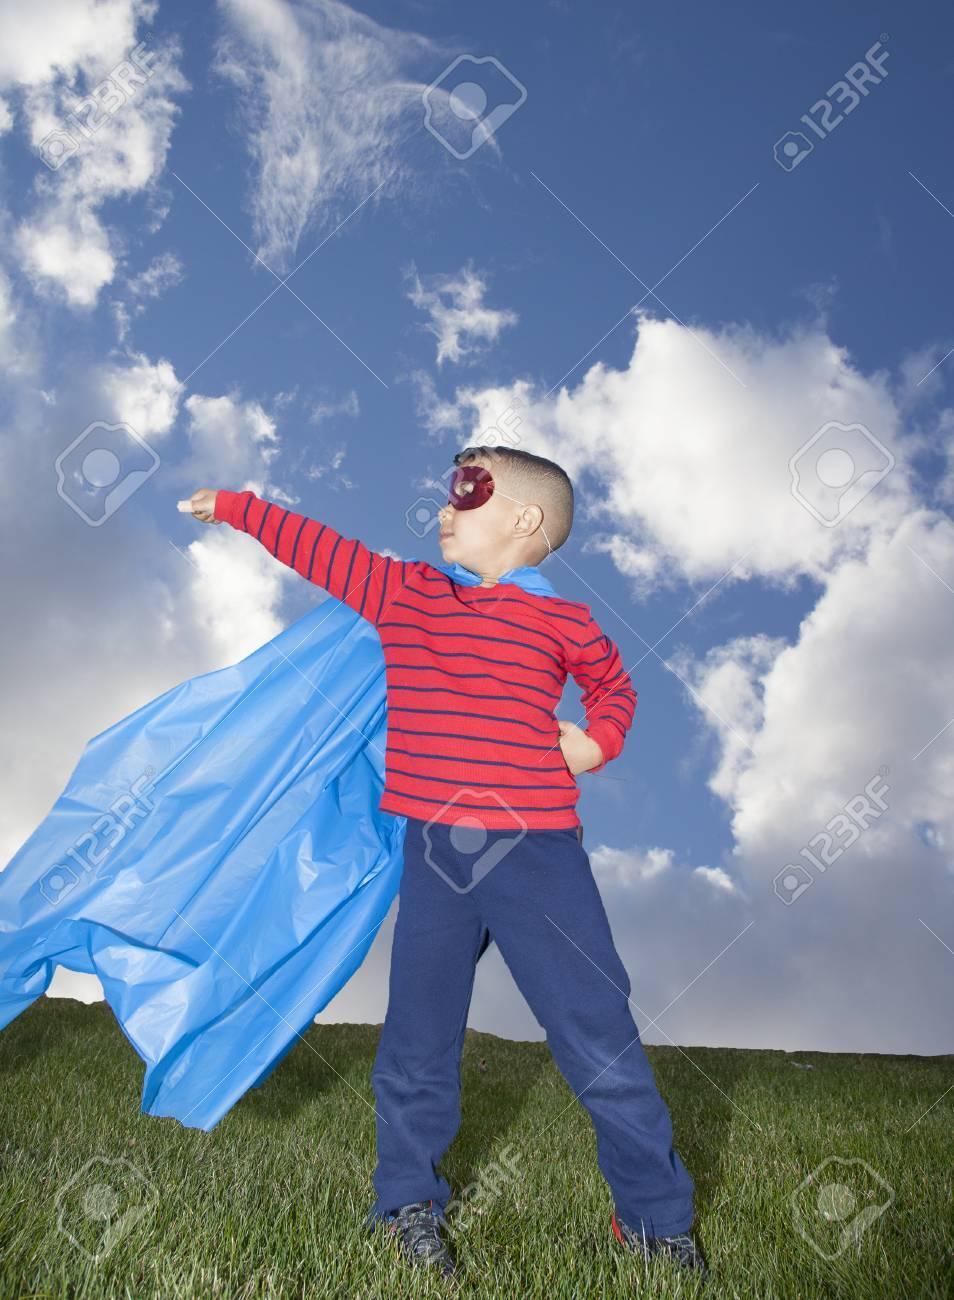 little boy superhero against blue sky - 39761882